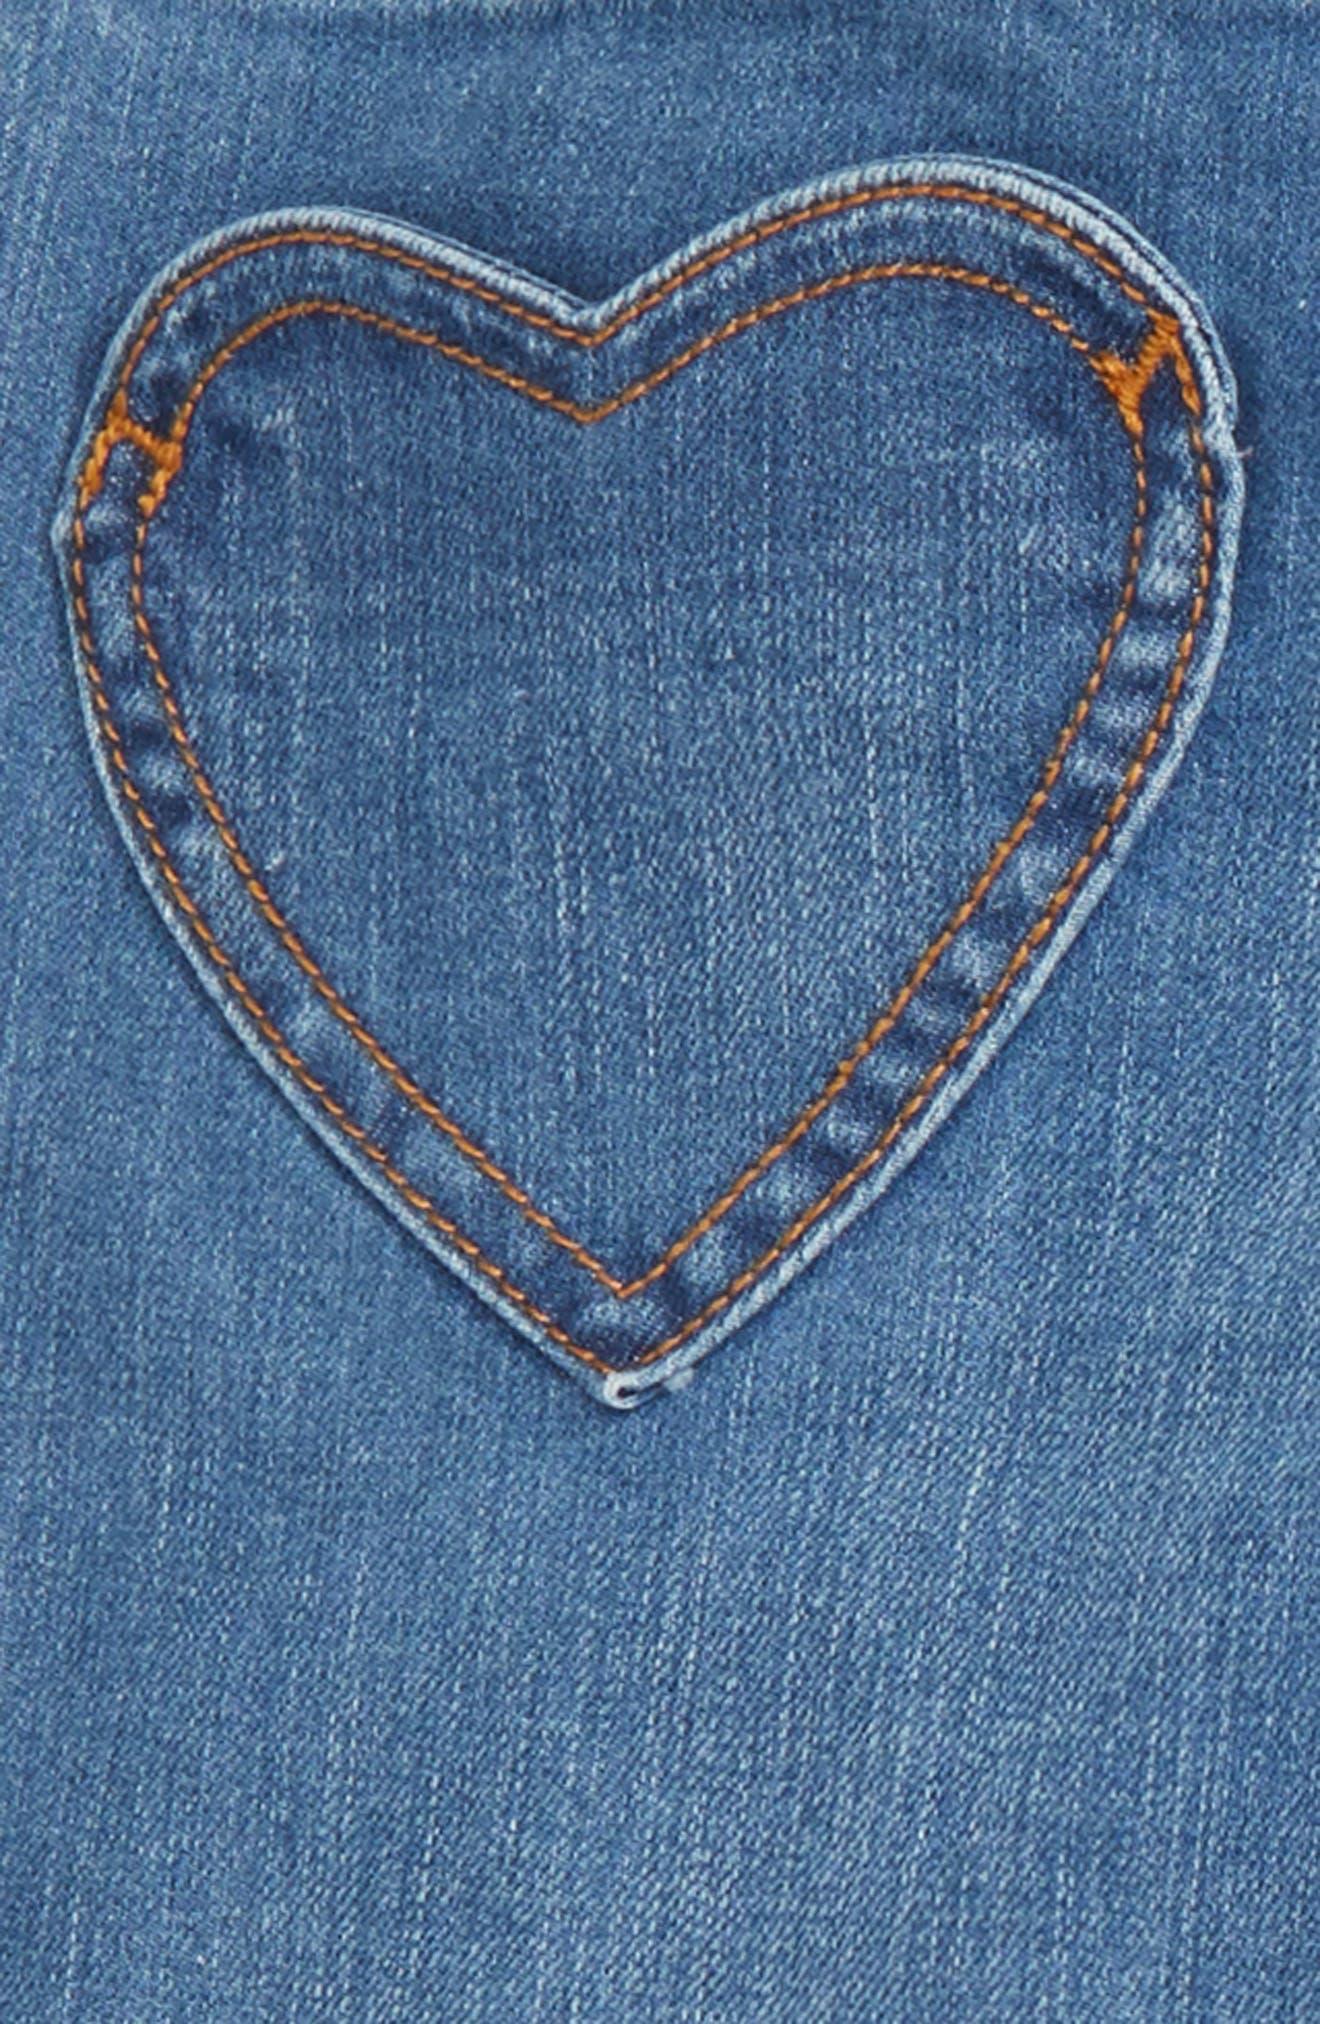 Heart Patch Jeans,                             Alternate thumbnail 3, color,                             MID VINTAGE